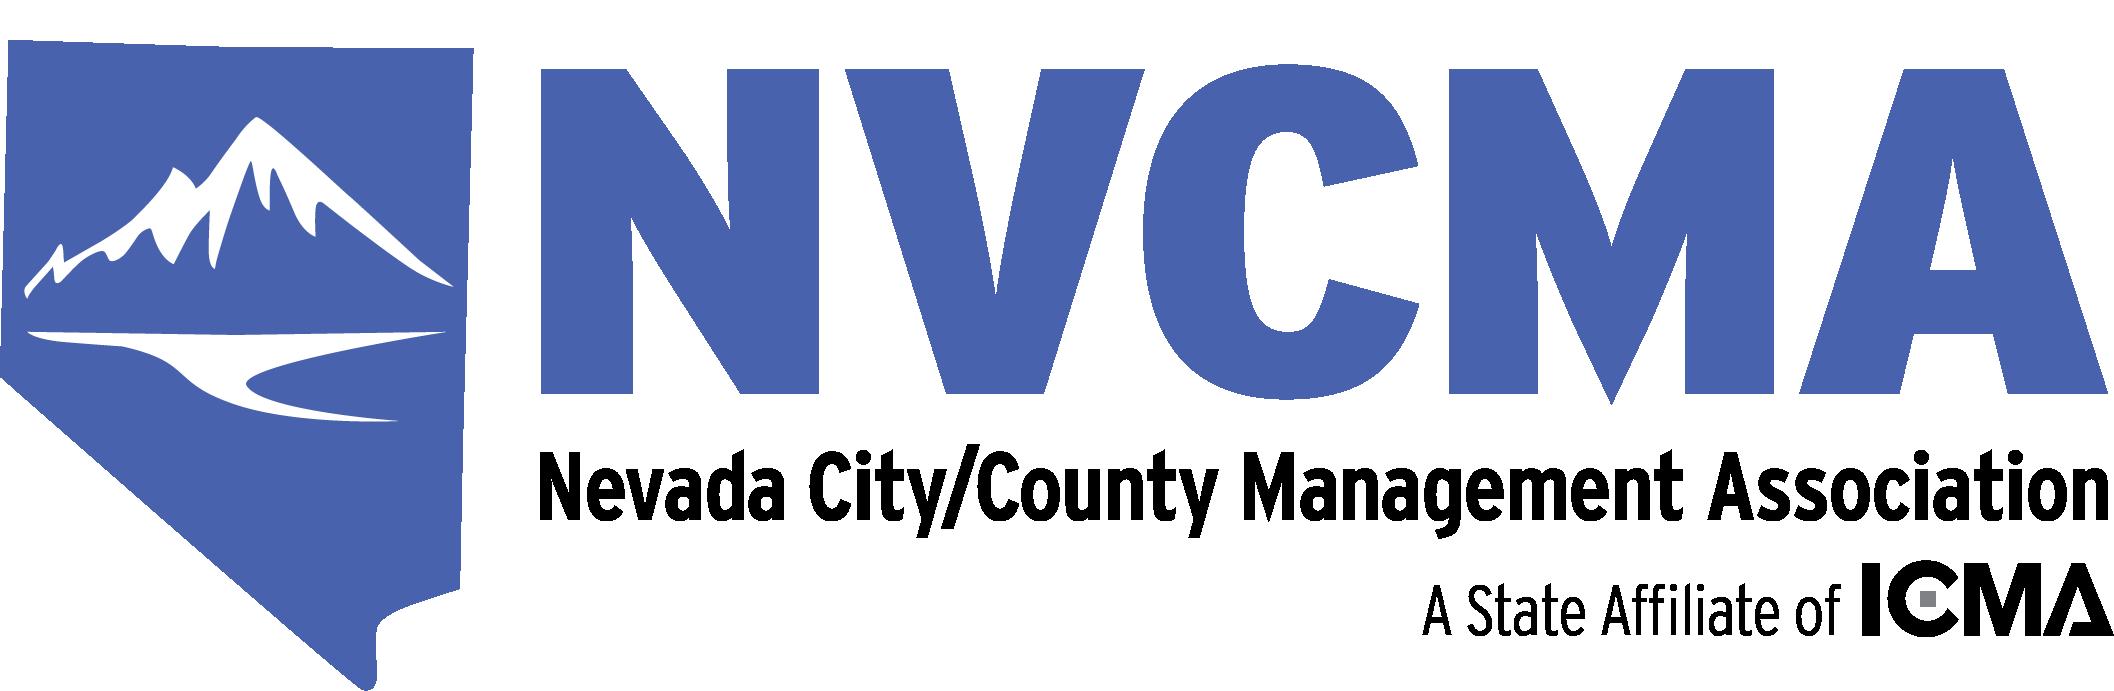 Nevada City/County Management Association